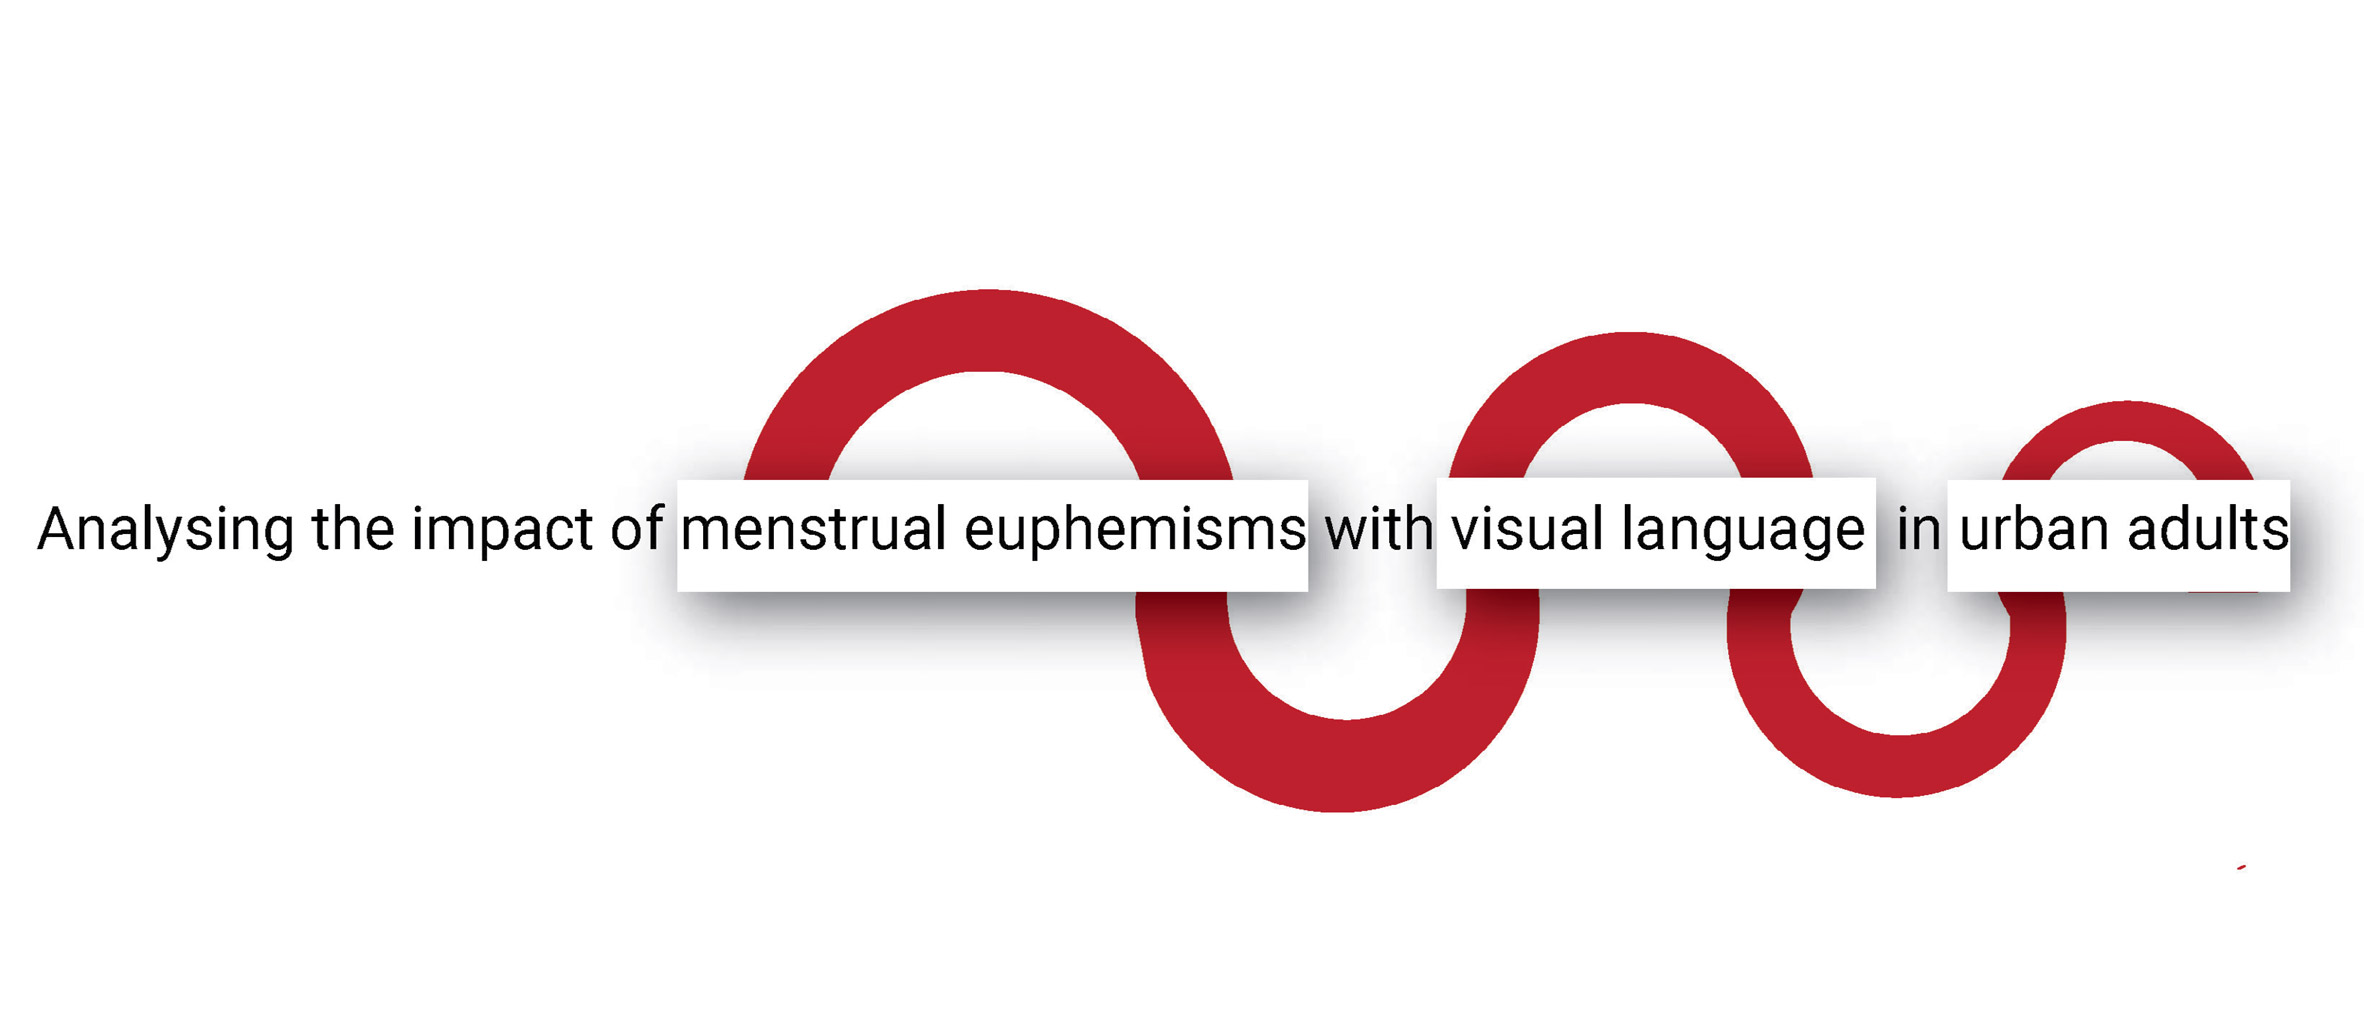 menstrual euphemisms